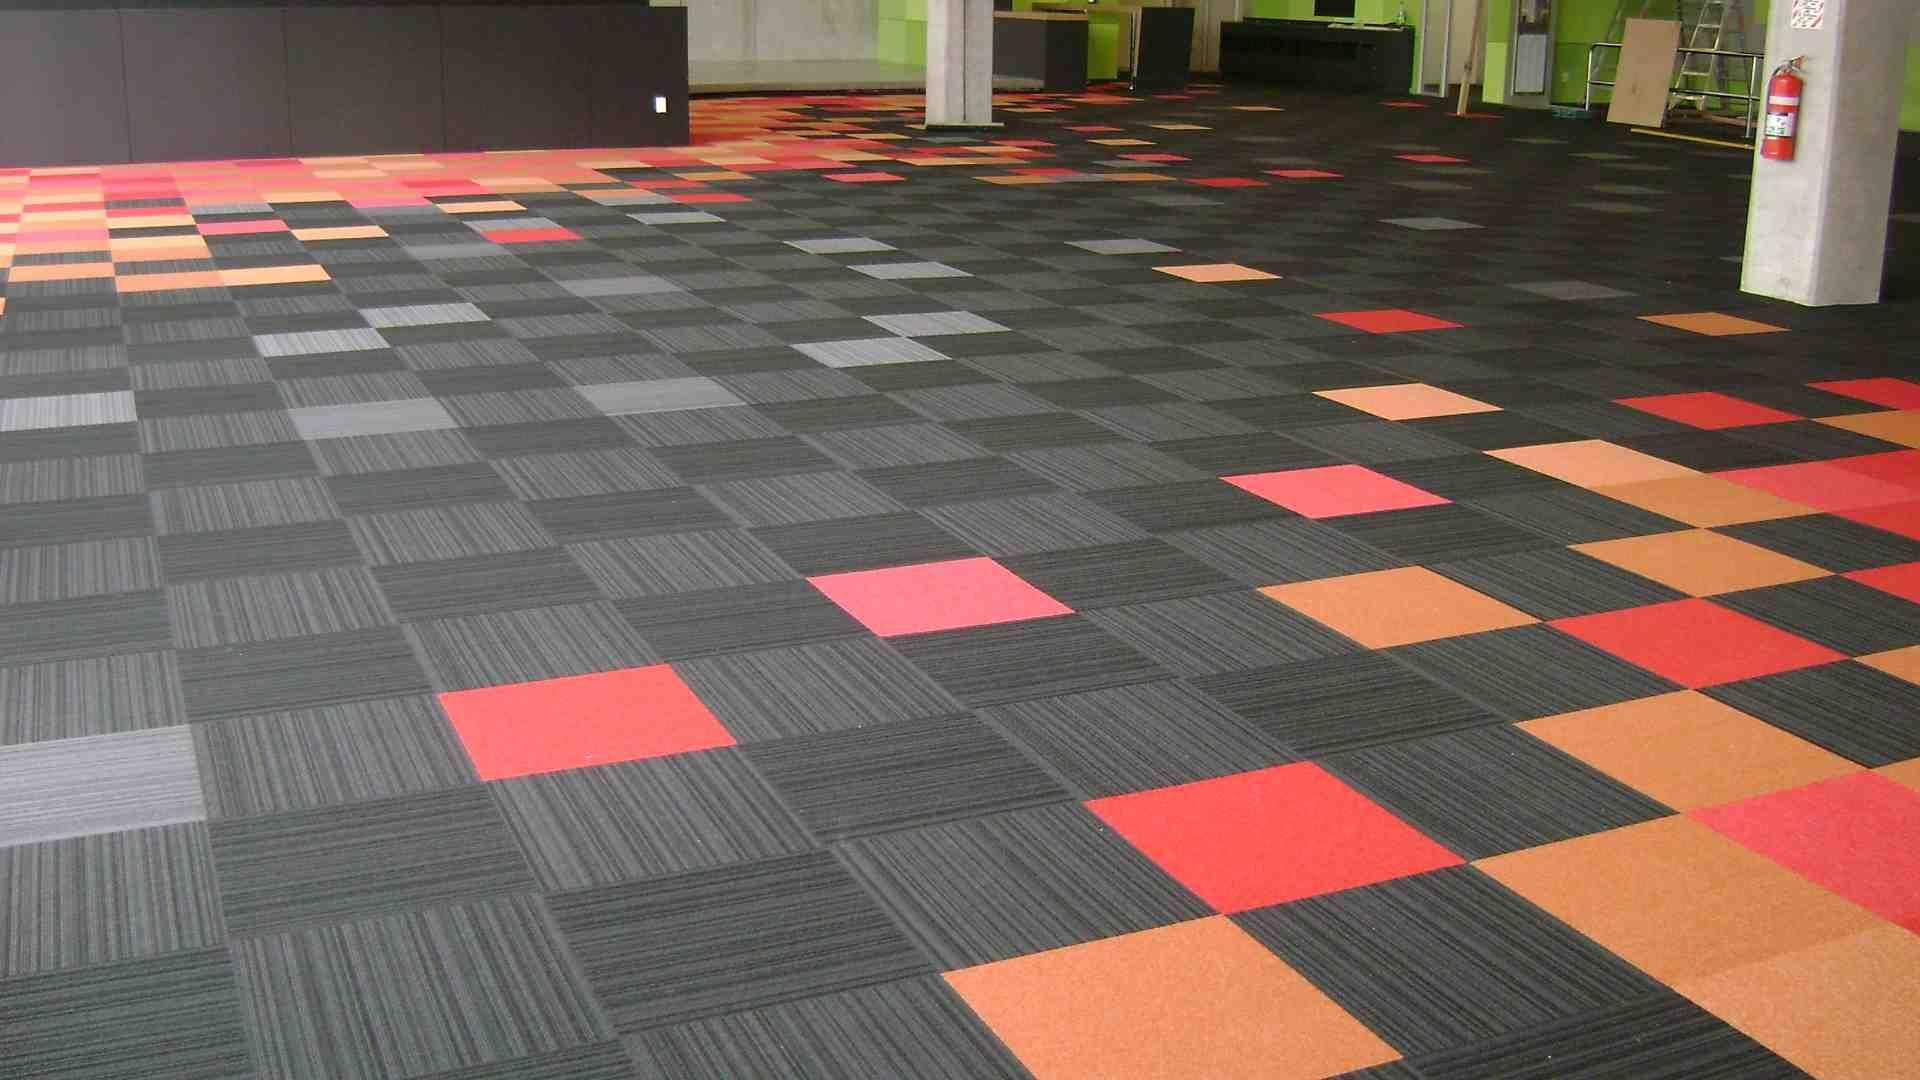 Prevention of Wood Floor Damage